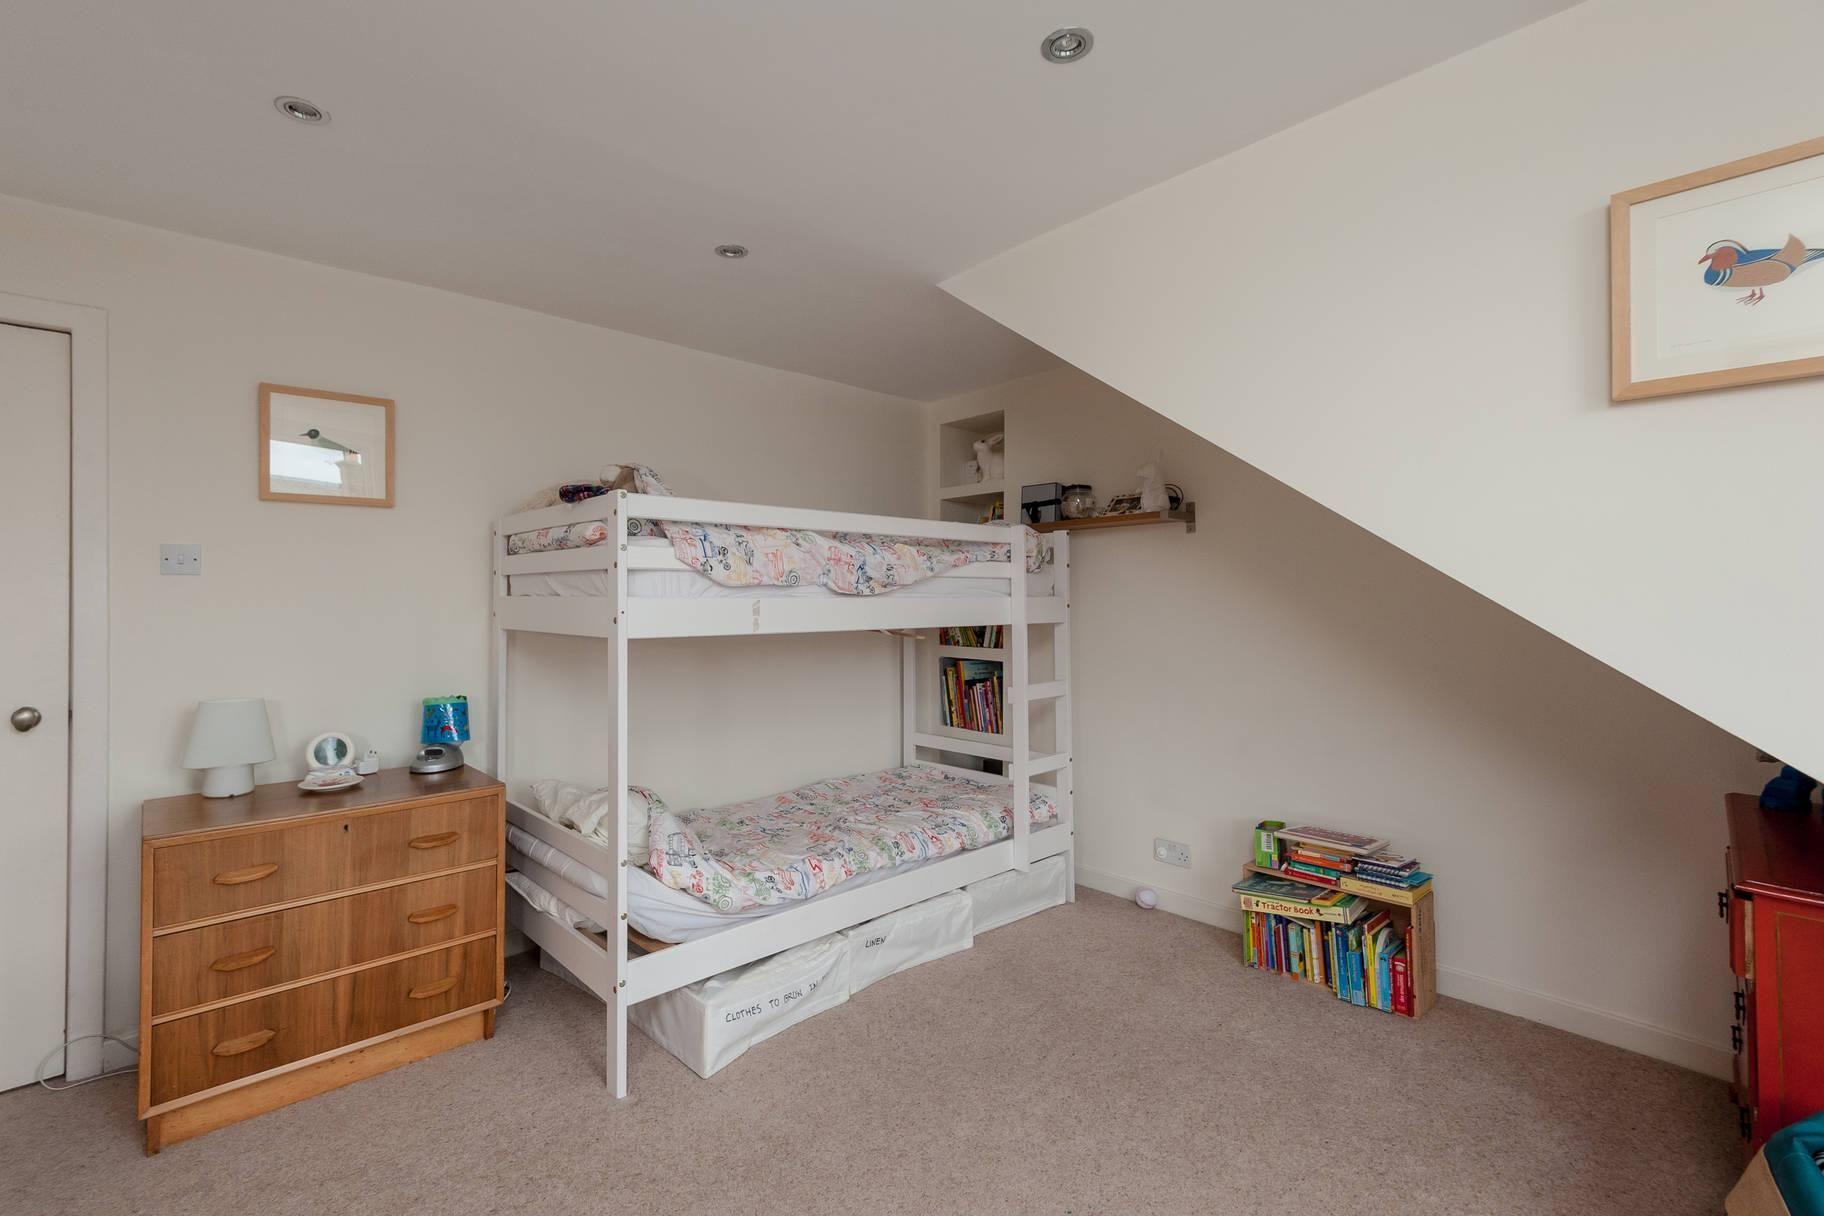 3 Briarbank Terrace, Shandon - Photo 9